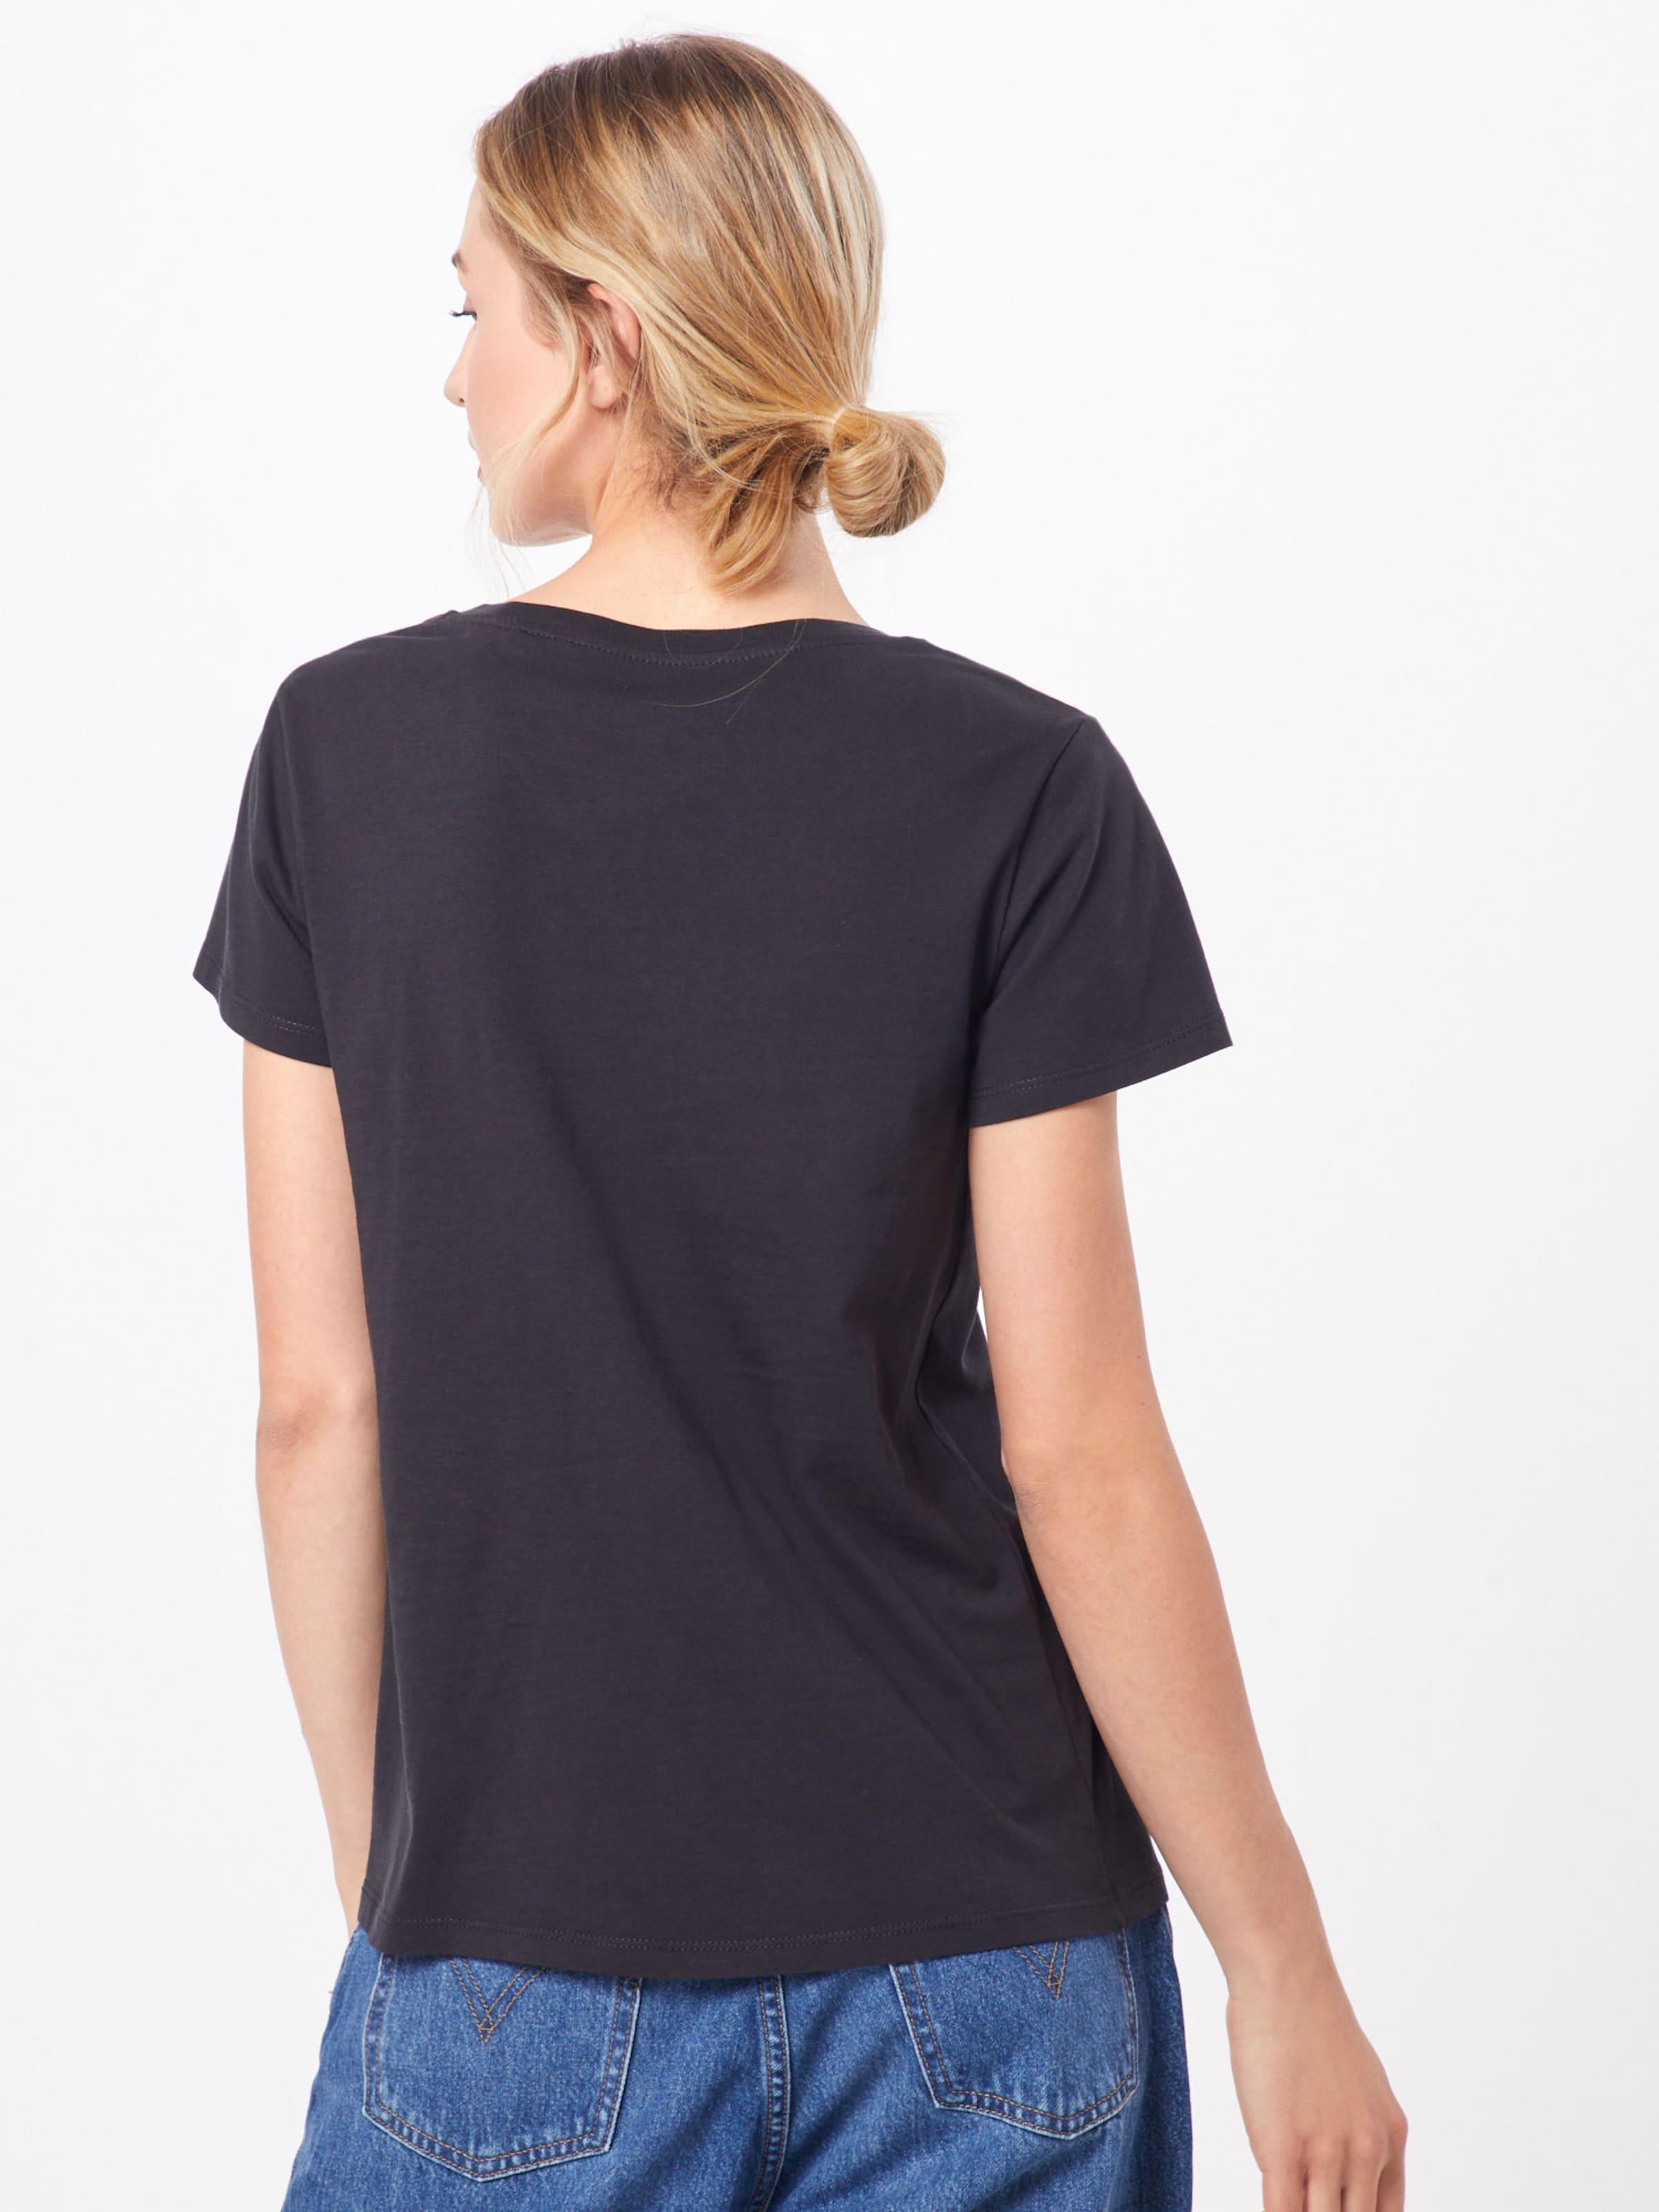 shirt En Levi's En Noir T T shirt Levi's 0XnwkZNO8P